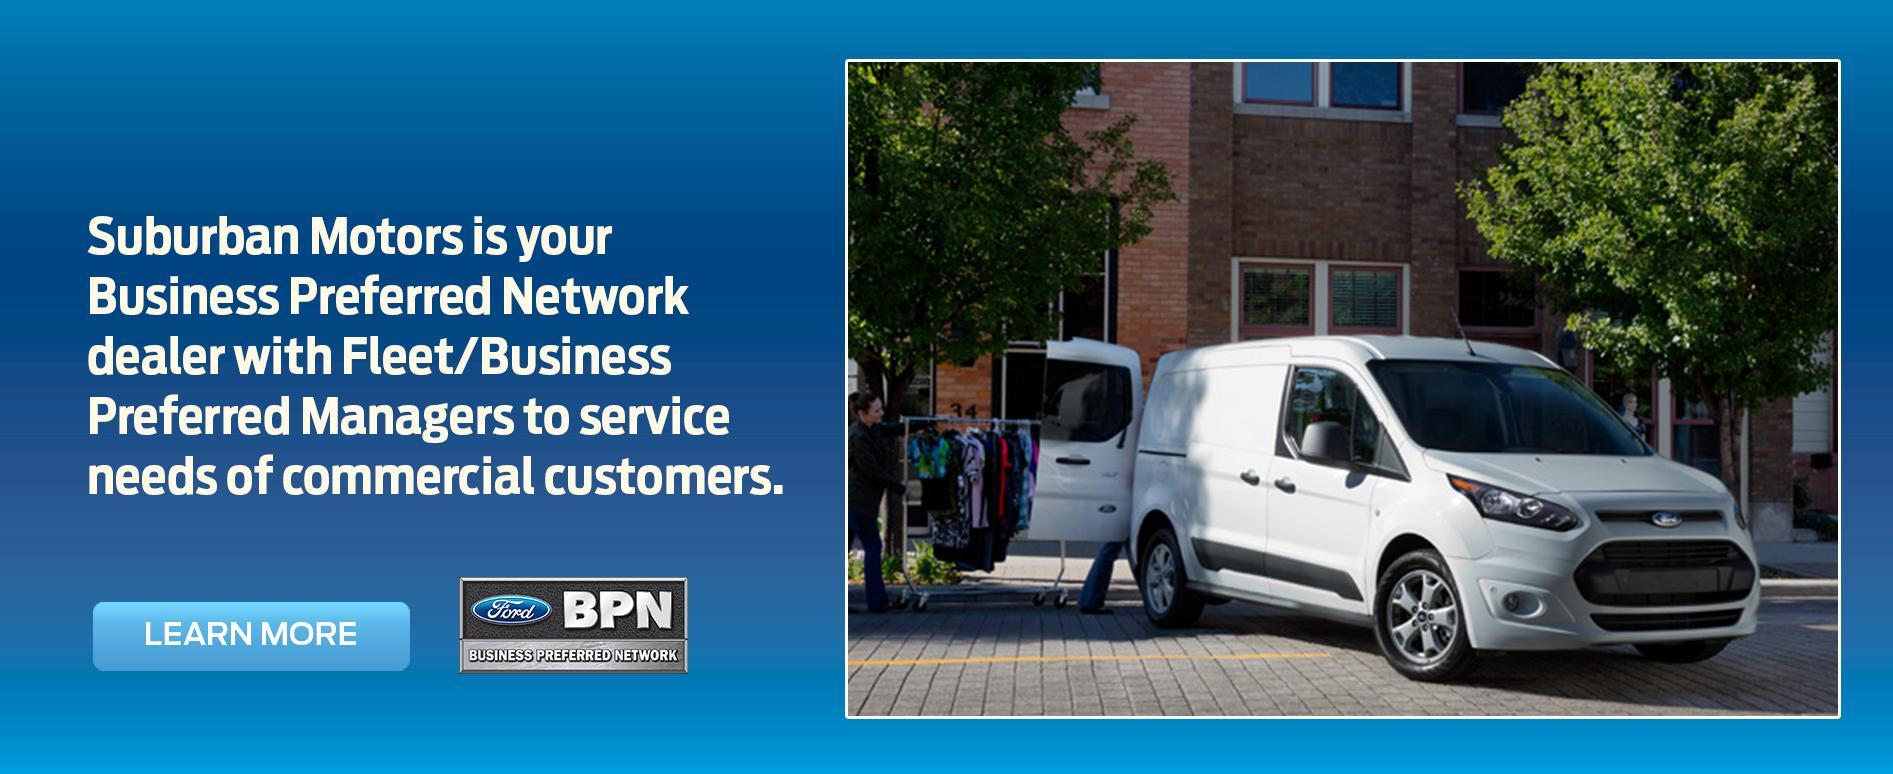 Suburban Motors BPN